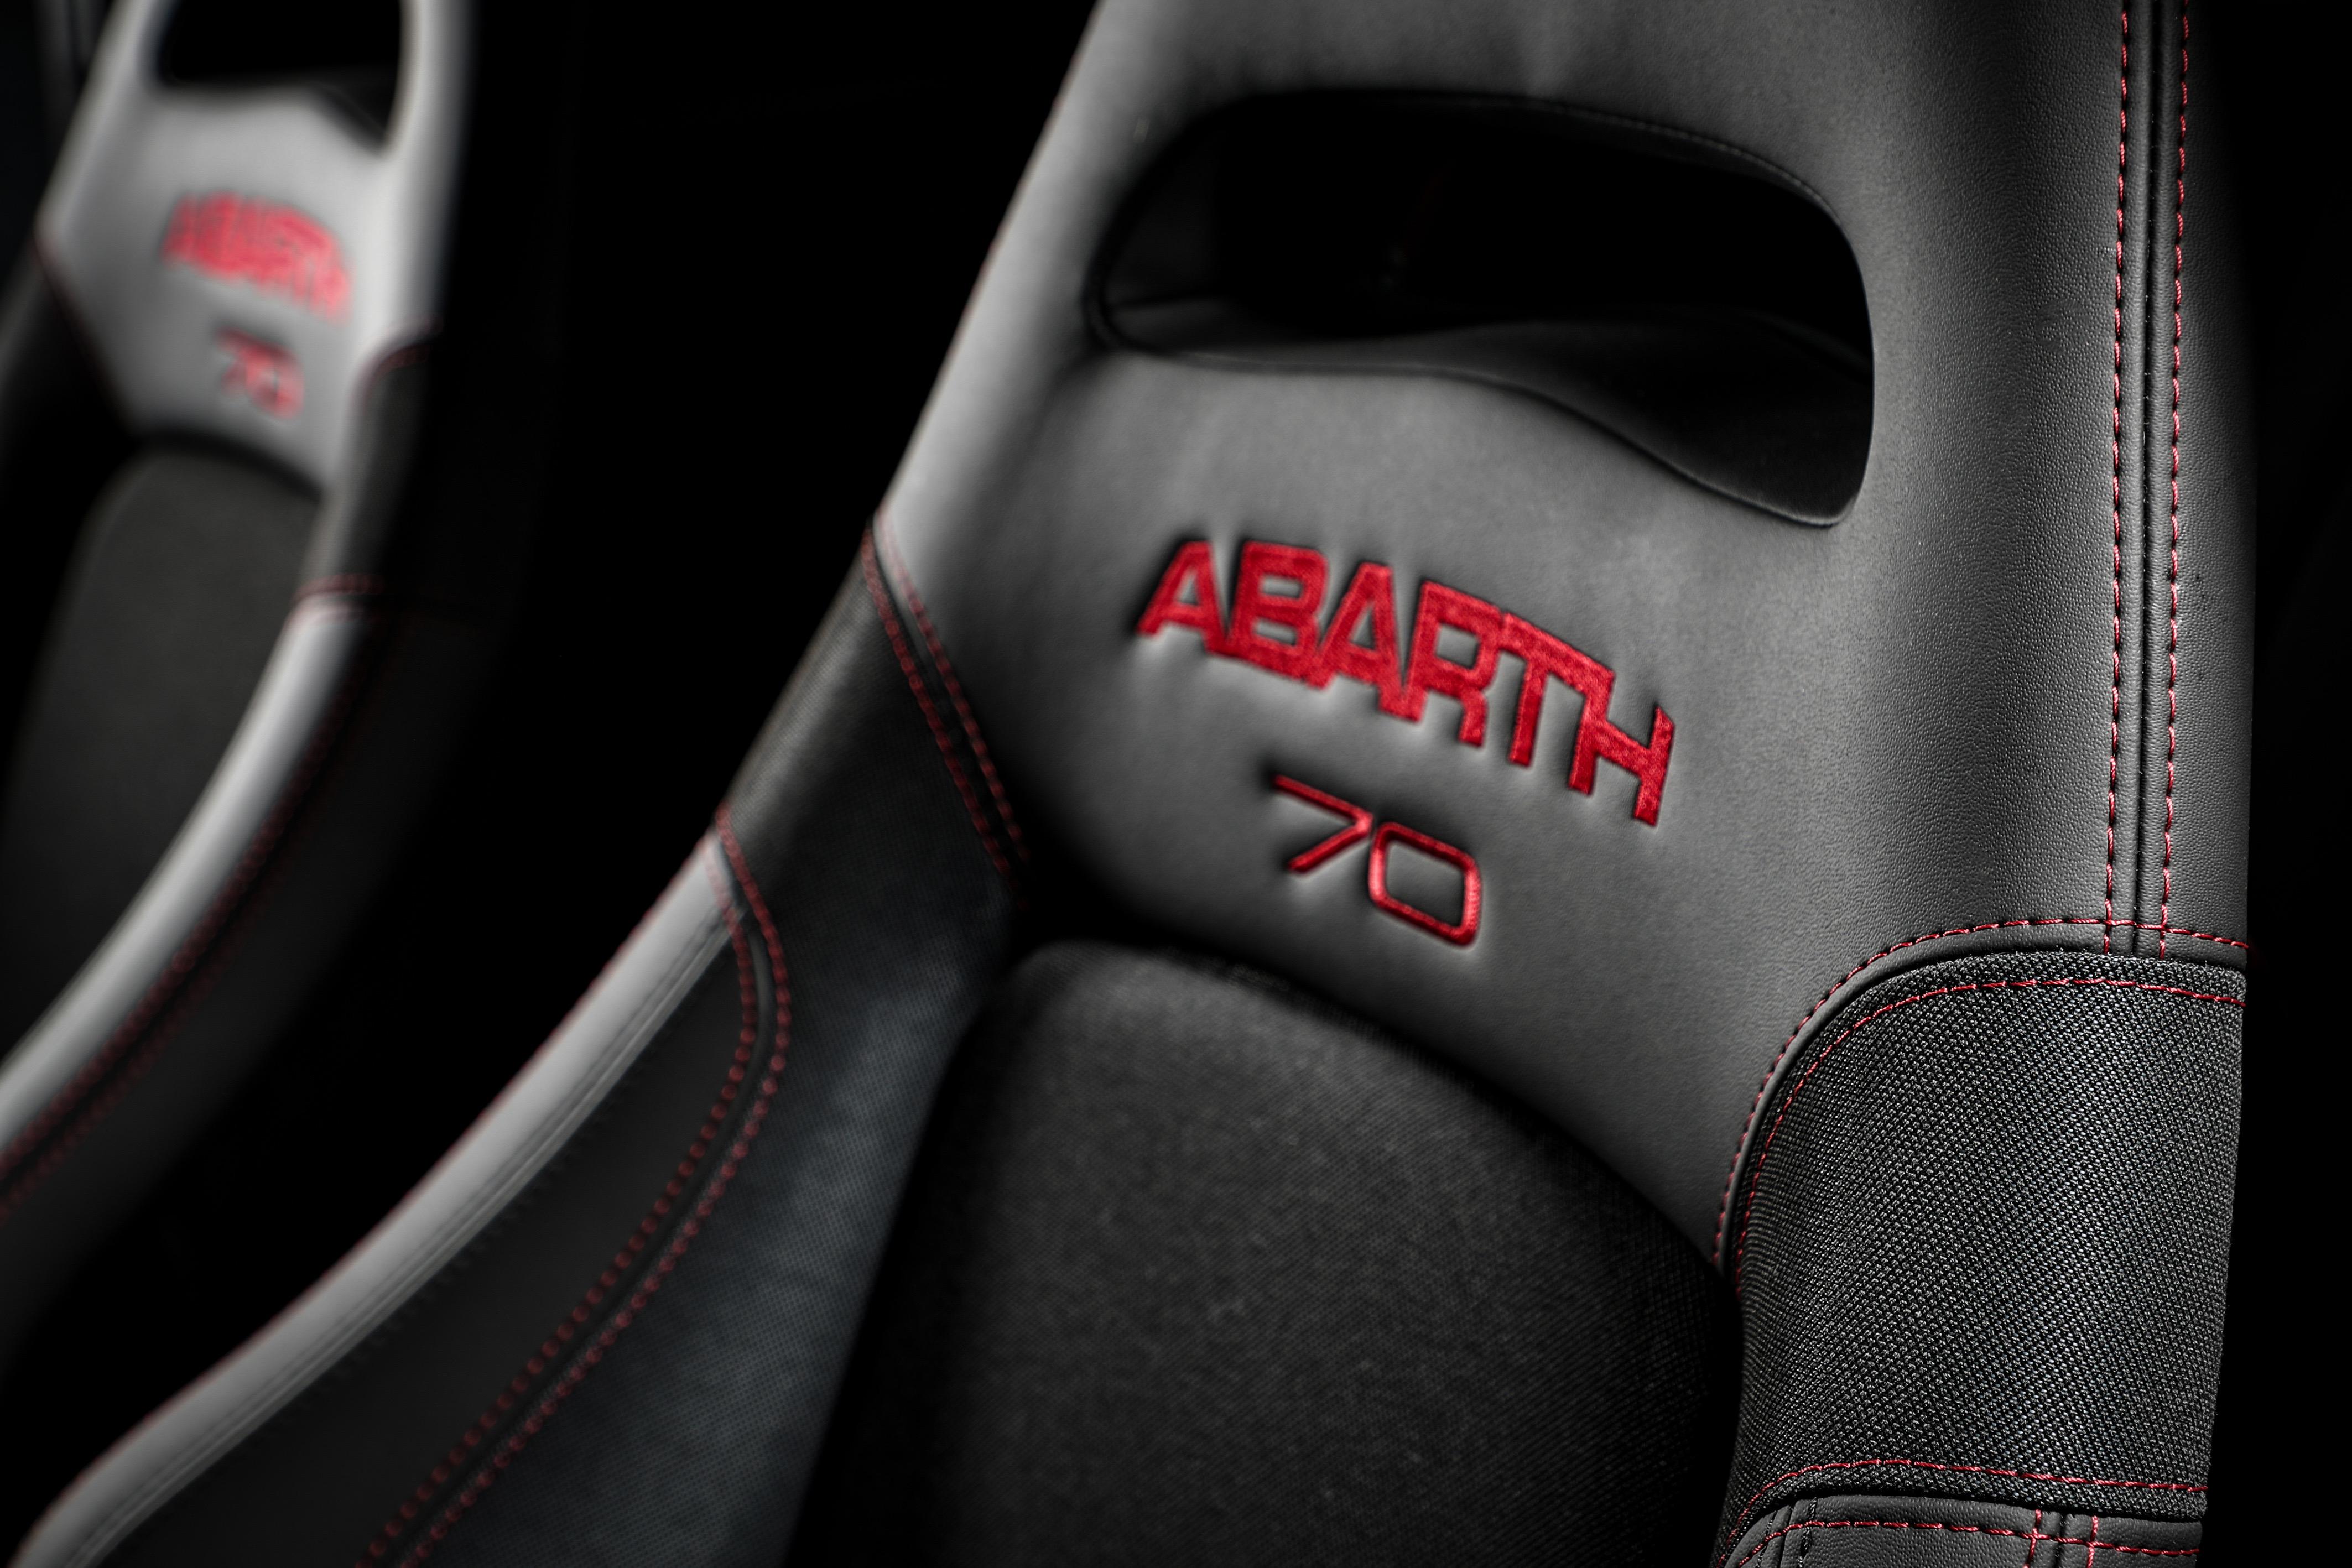 Abarth, Abarth to celebrate 70th anniversary at Geneva show, ClassicCars.com Journal